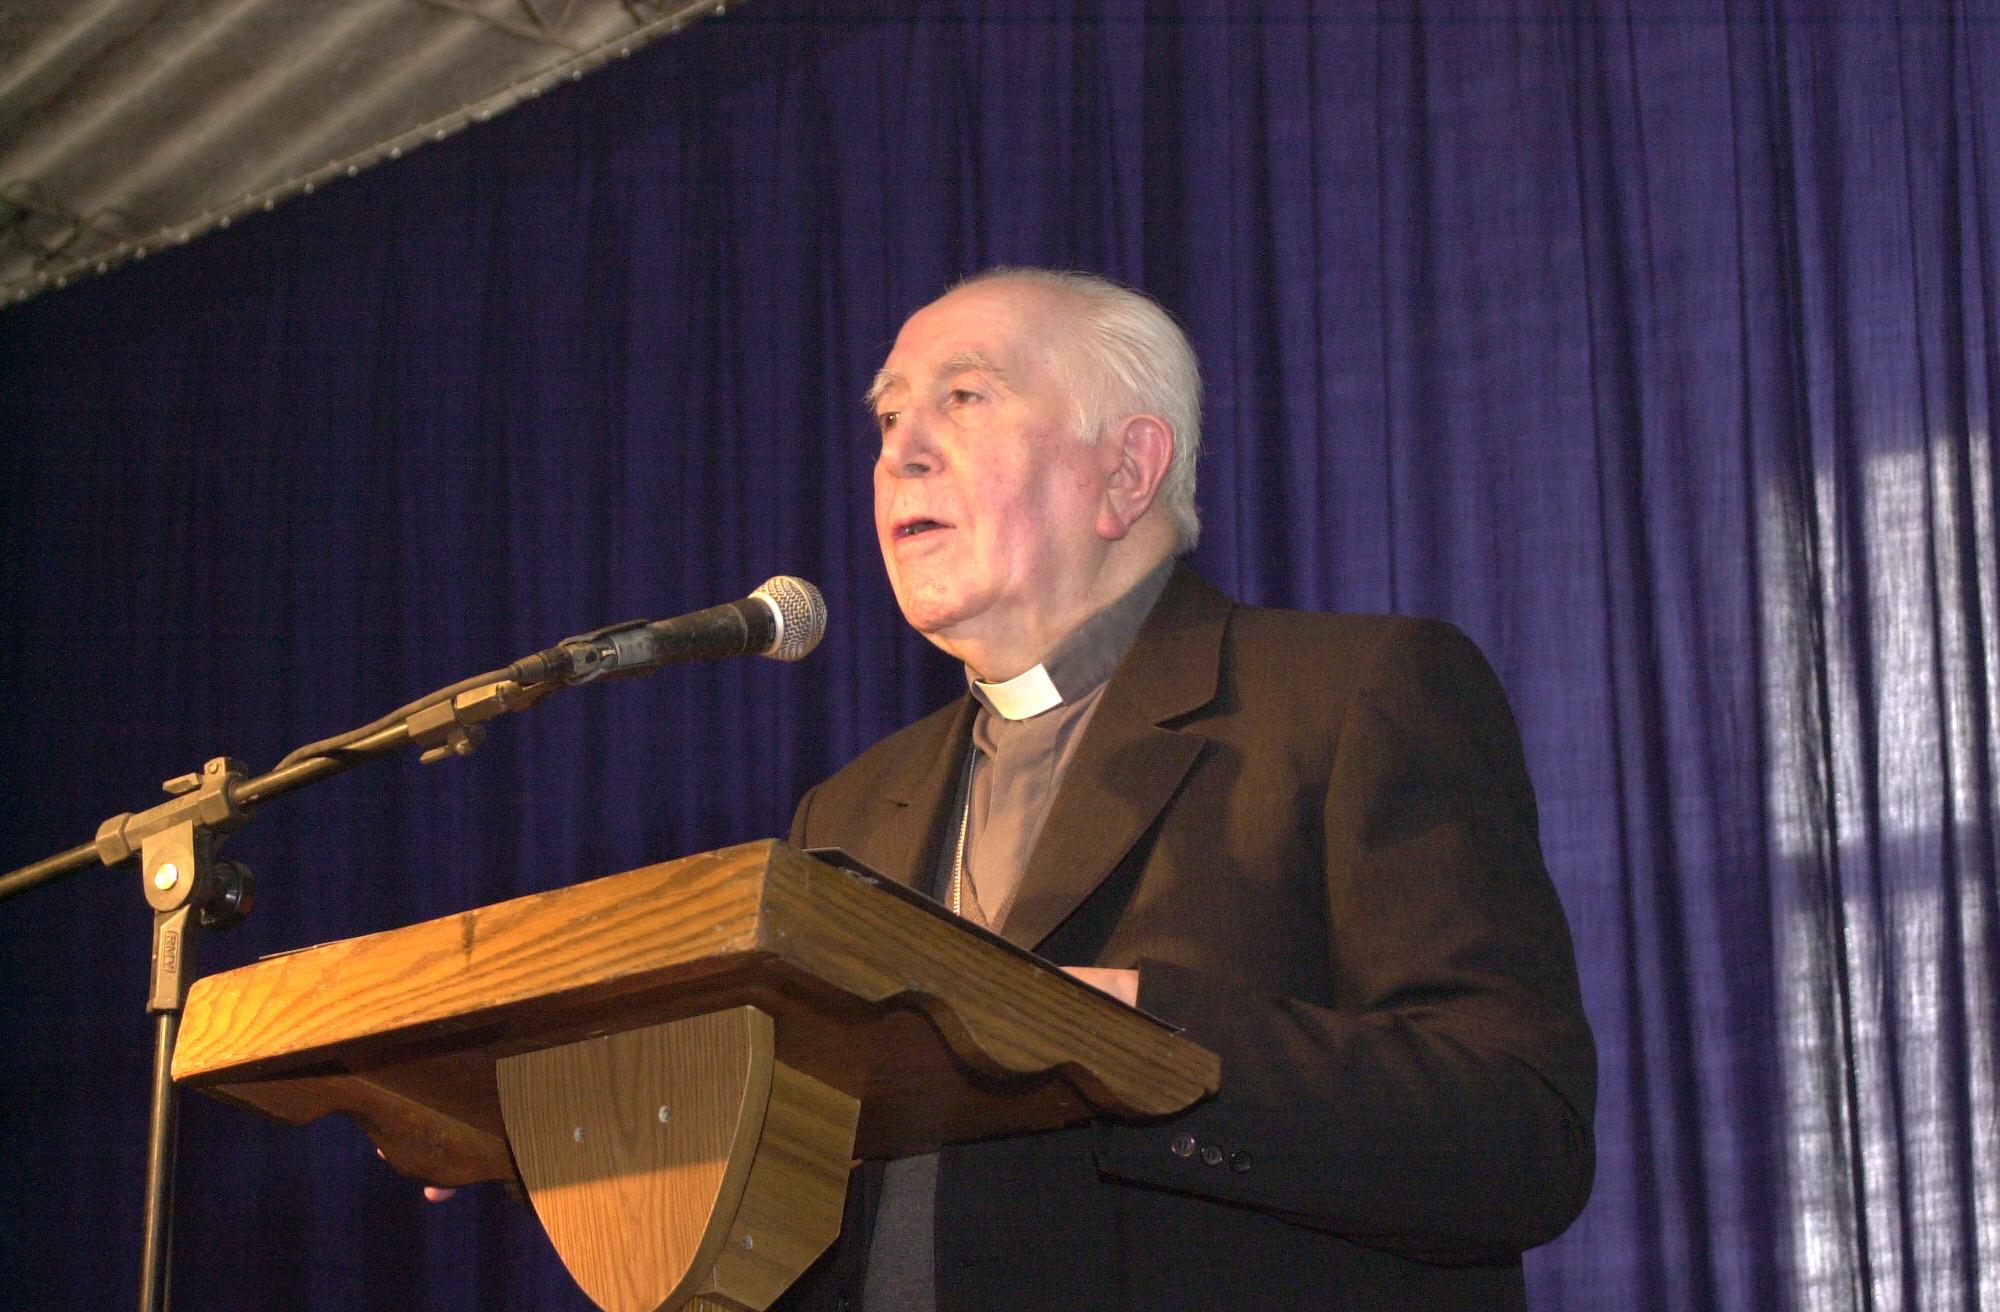 Con Misa Recuerdan a Monseñor Carlos González Cruchaga